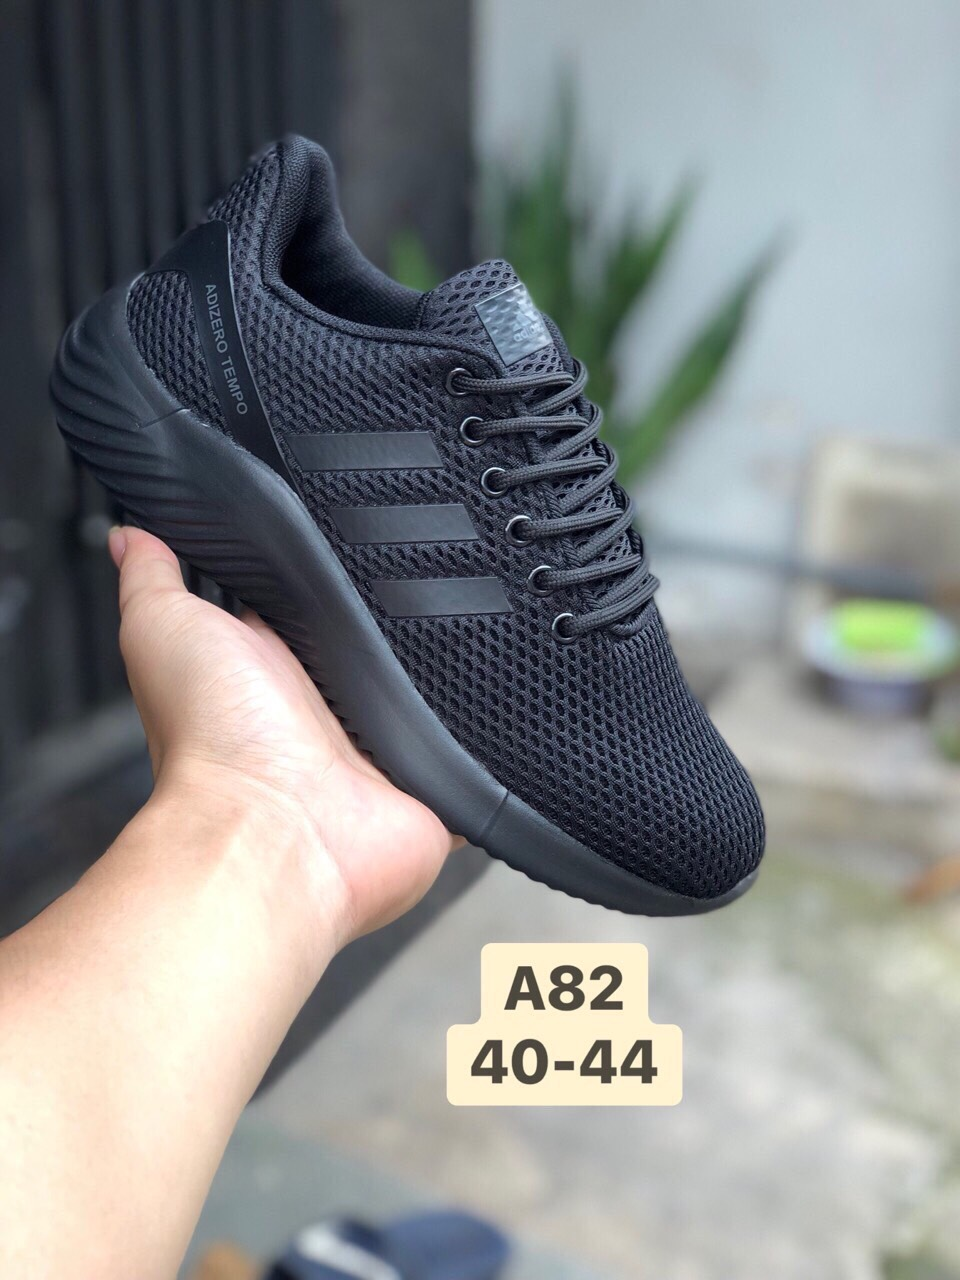 Giày Adidas Neo A82 đen full